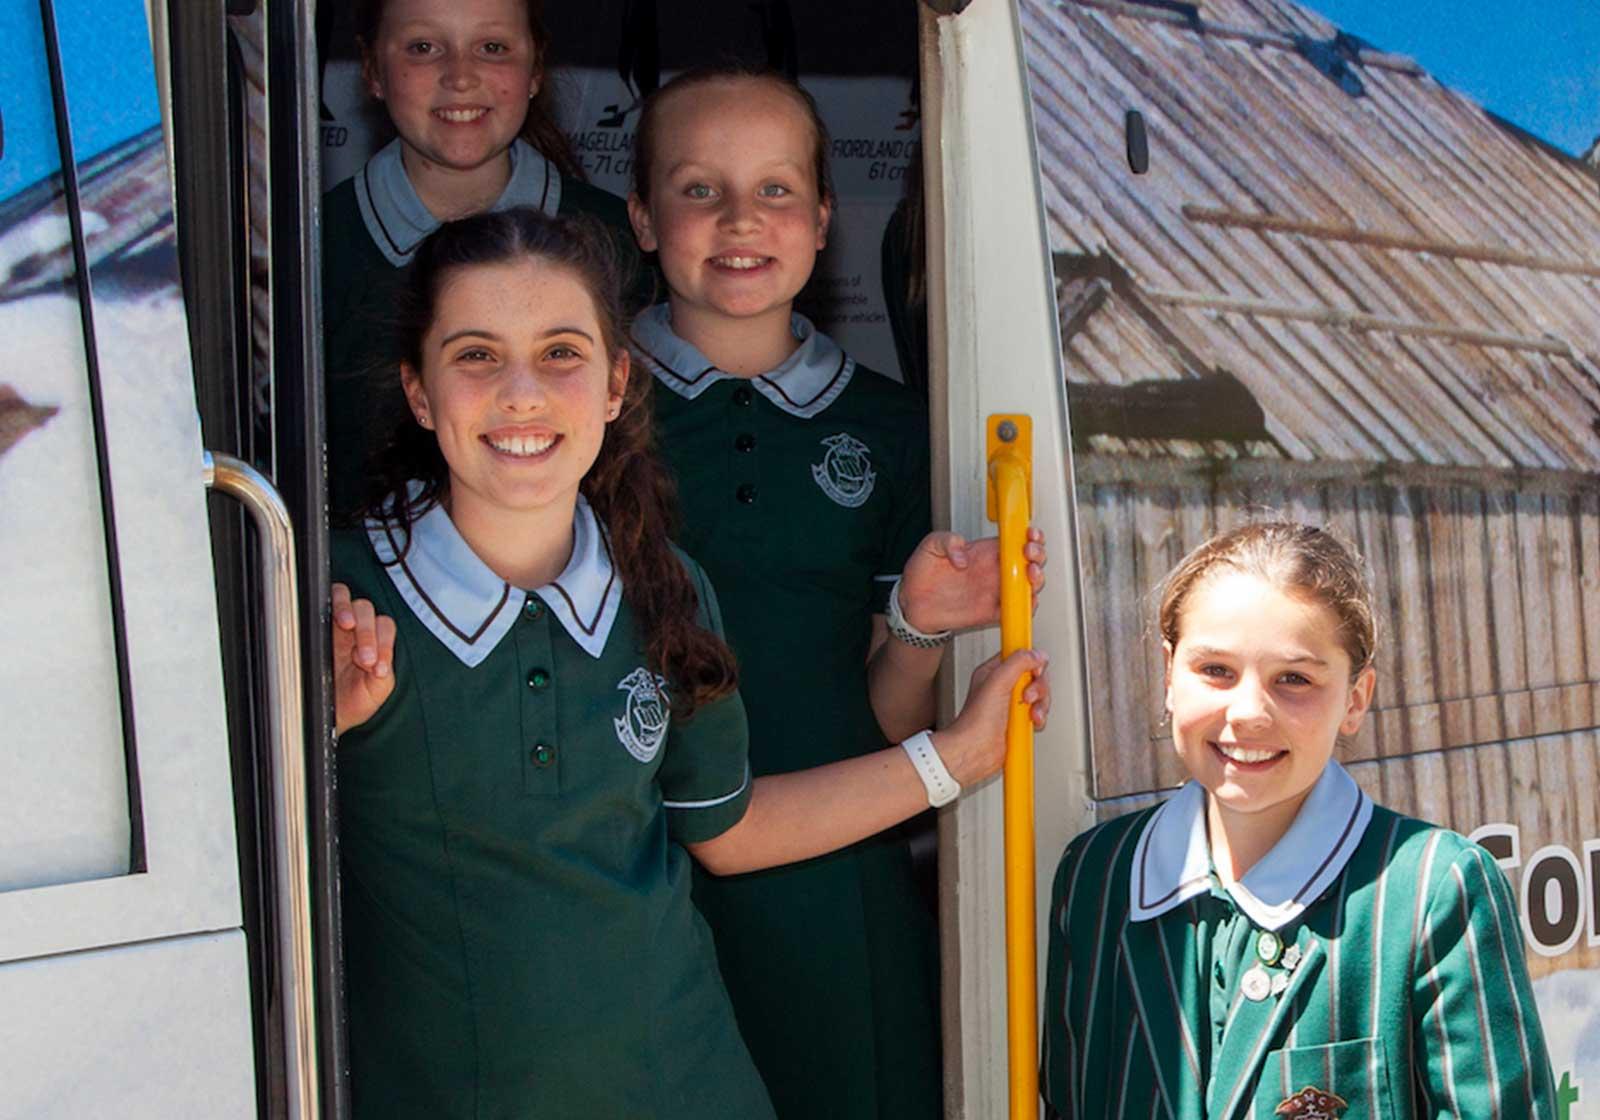 Mawson, Mawson's Huts, Mawson's Huts Foundation, Australia's Antarctic Heritage, Antarctic History, Mobile Antarctic Classroom, Antarctic Environmental and Sustainability Bus